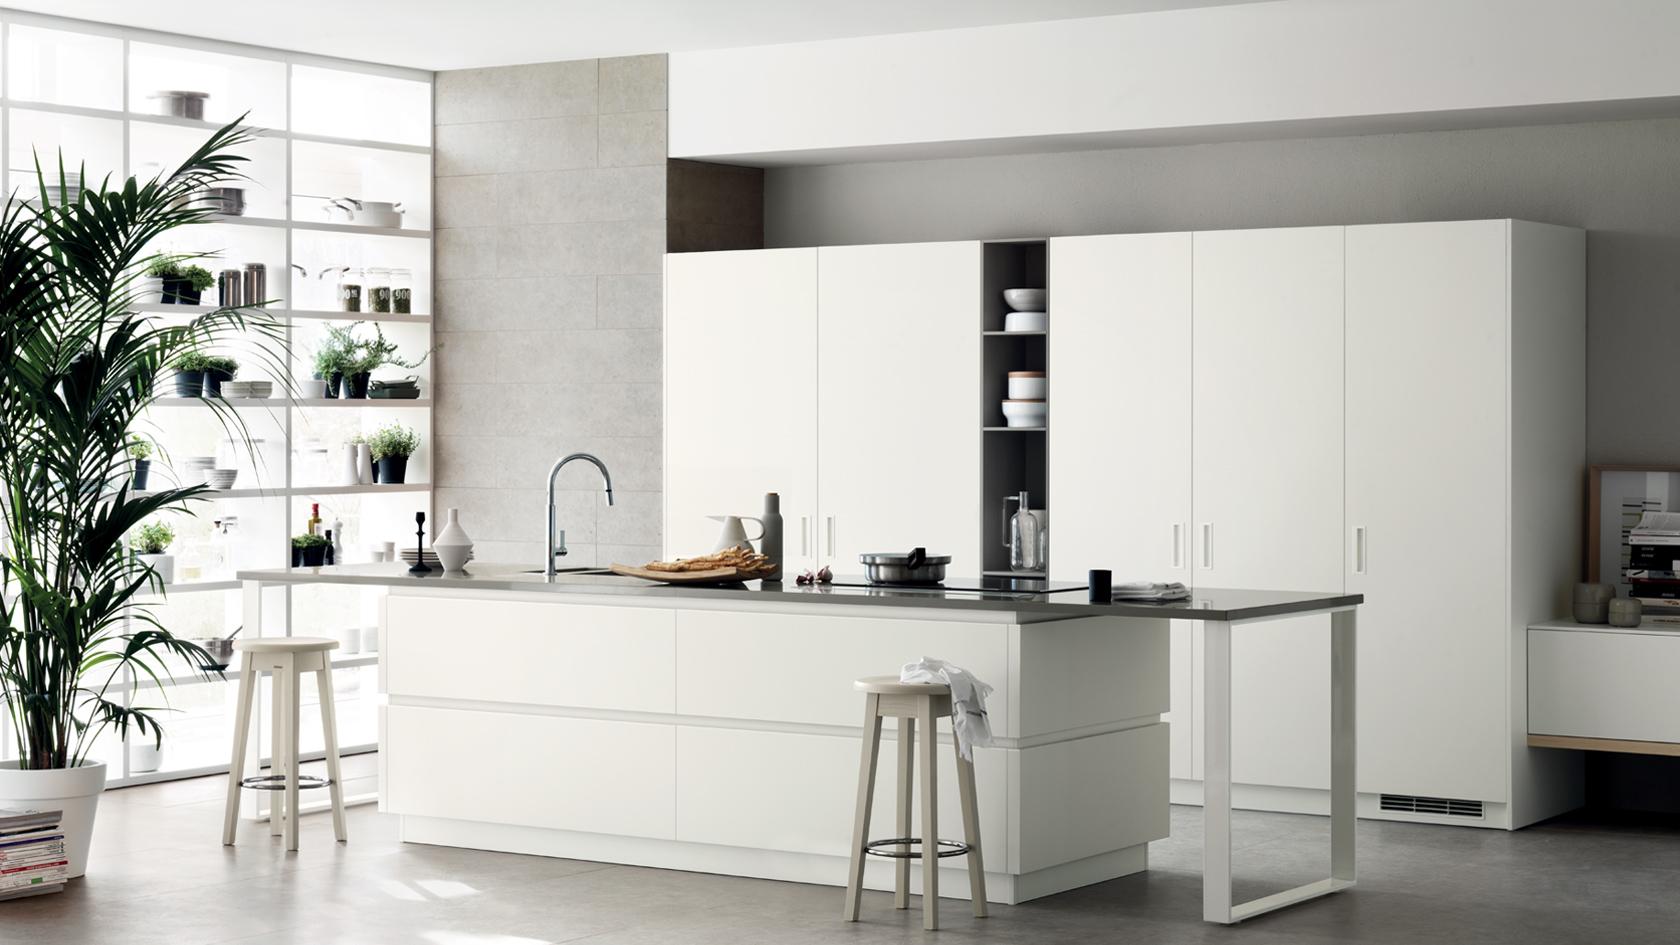 Cucina foodshelf giovannetti mobili - Giovannetti mobili ...